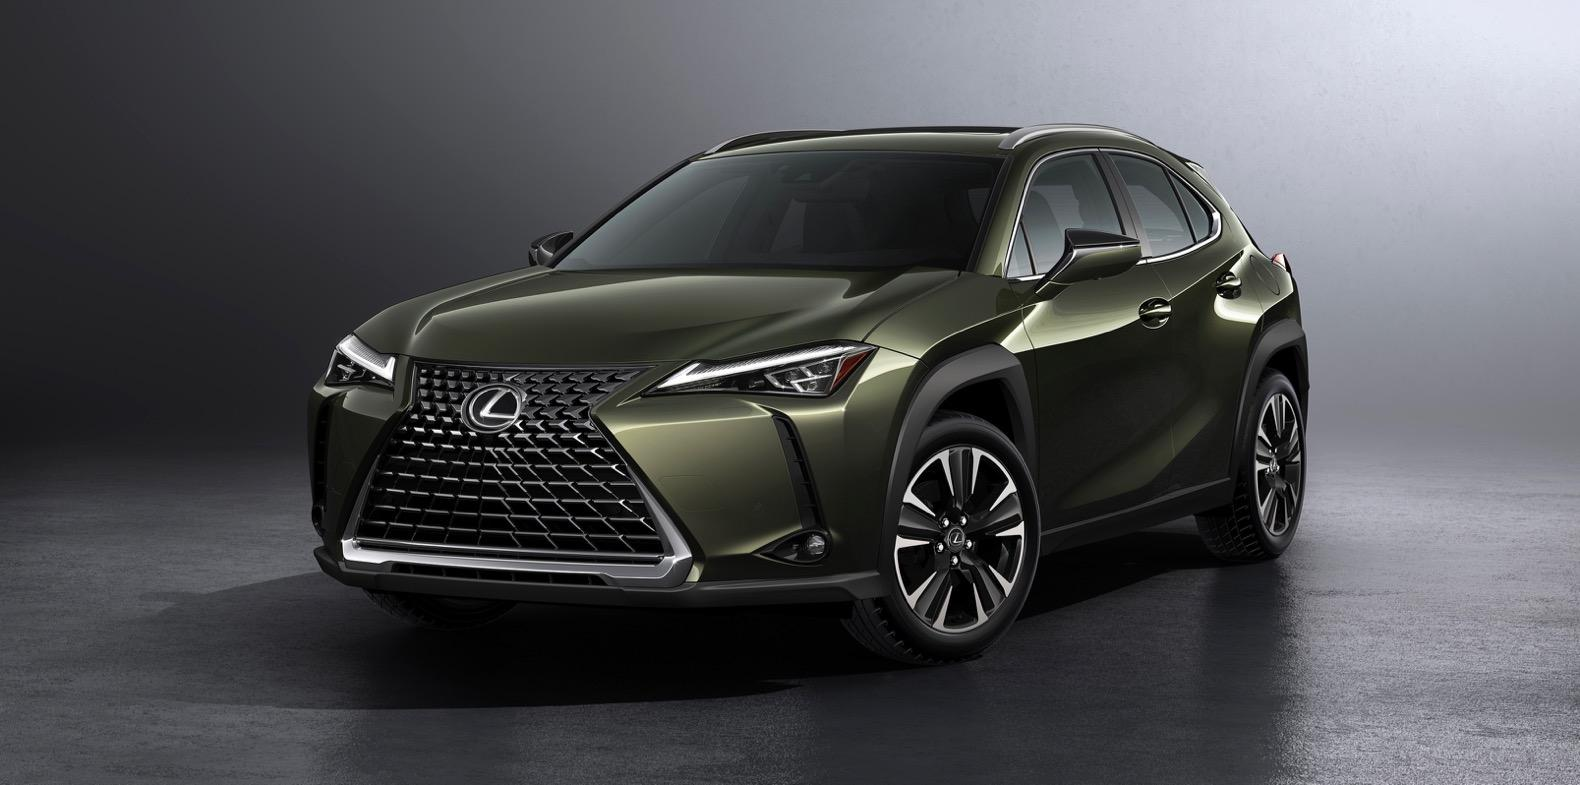 2019-Lexus-UX-0002.jpg